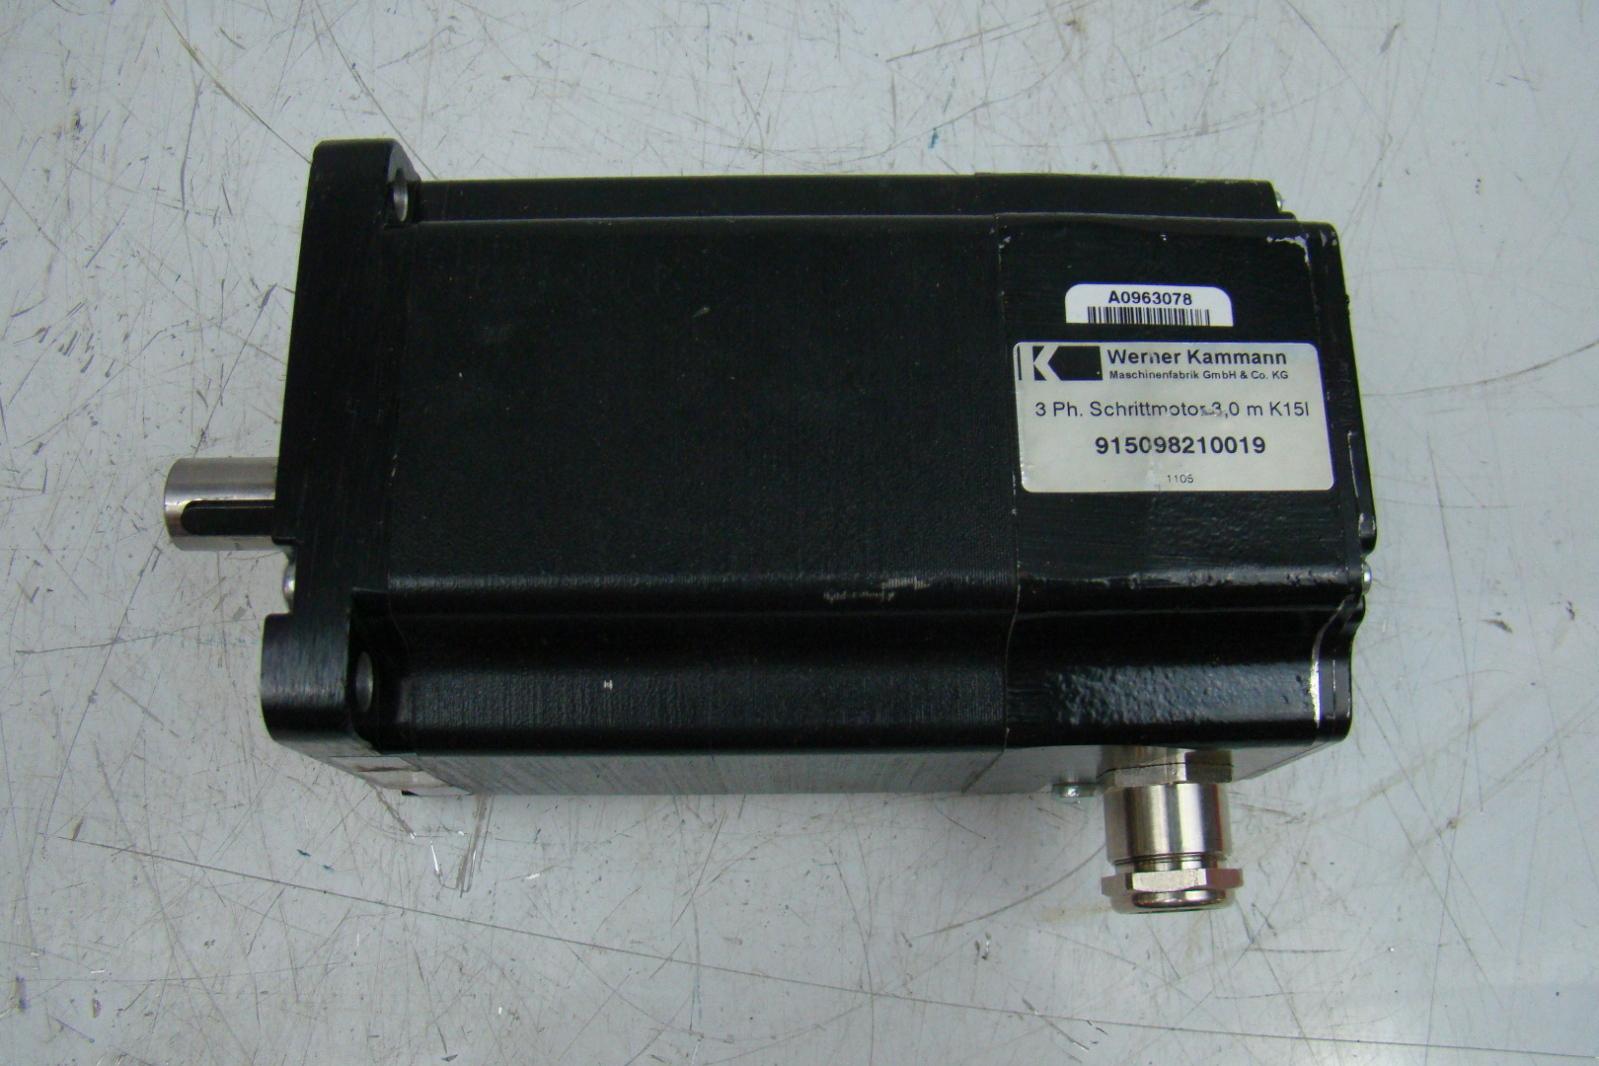 Berger Lahr Inverter Duty Motor 1000rpm Vrdm31117 50lwboo